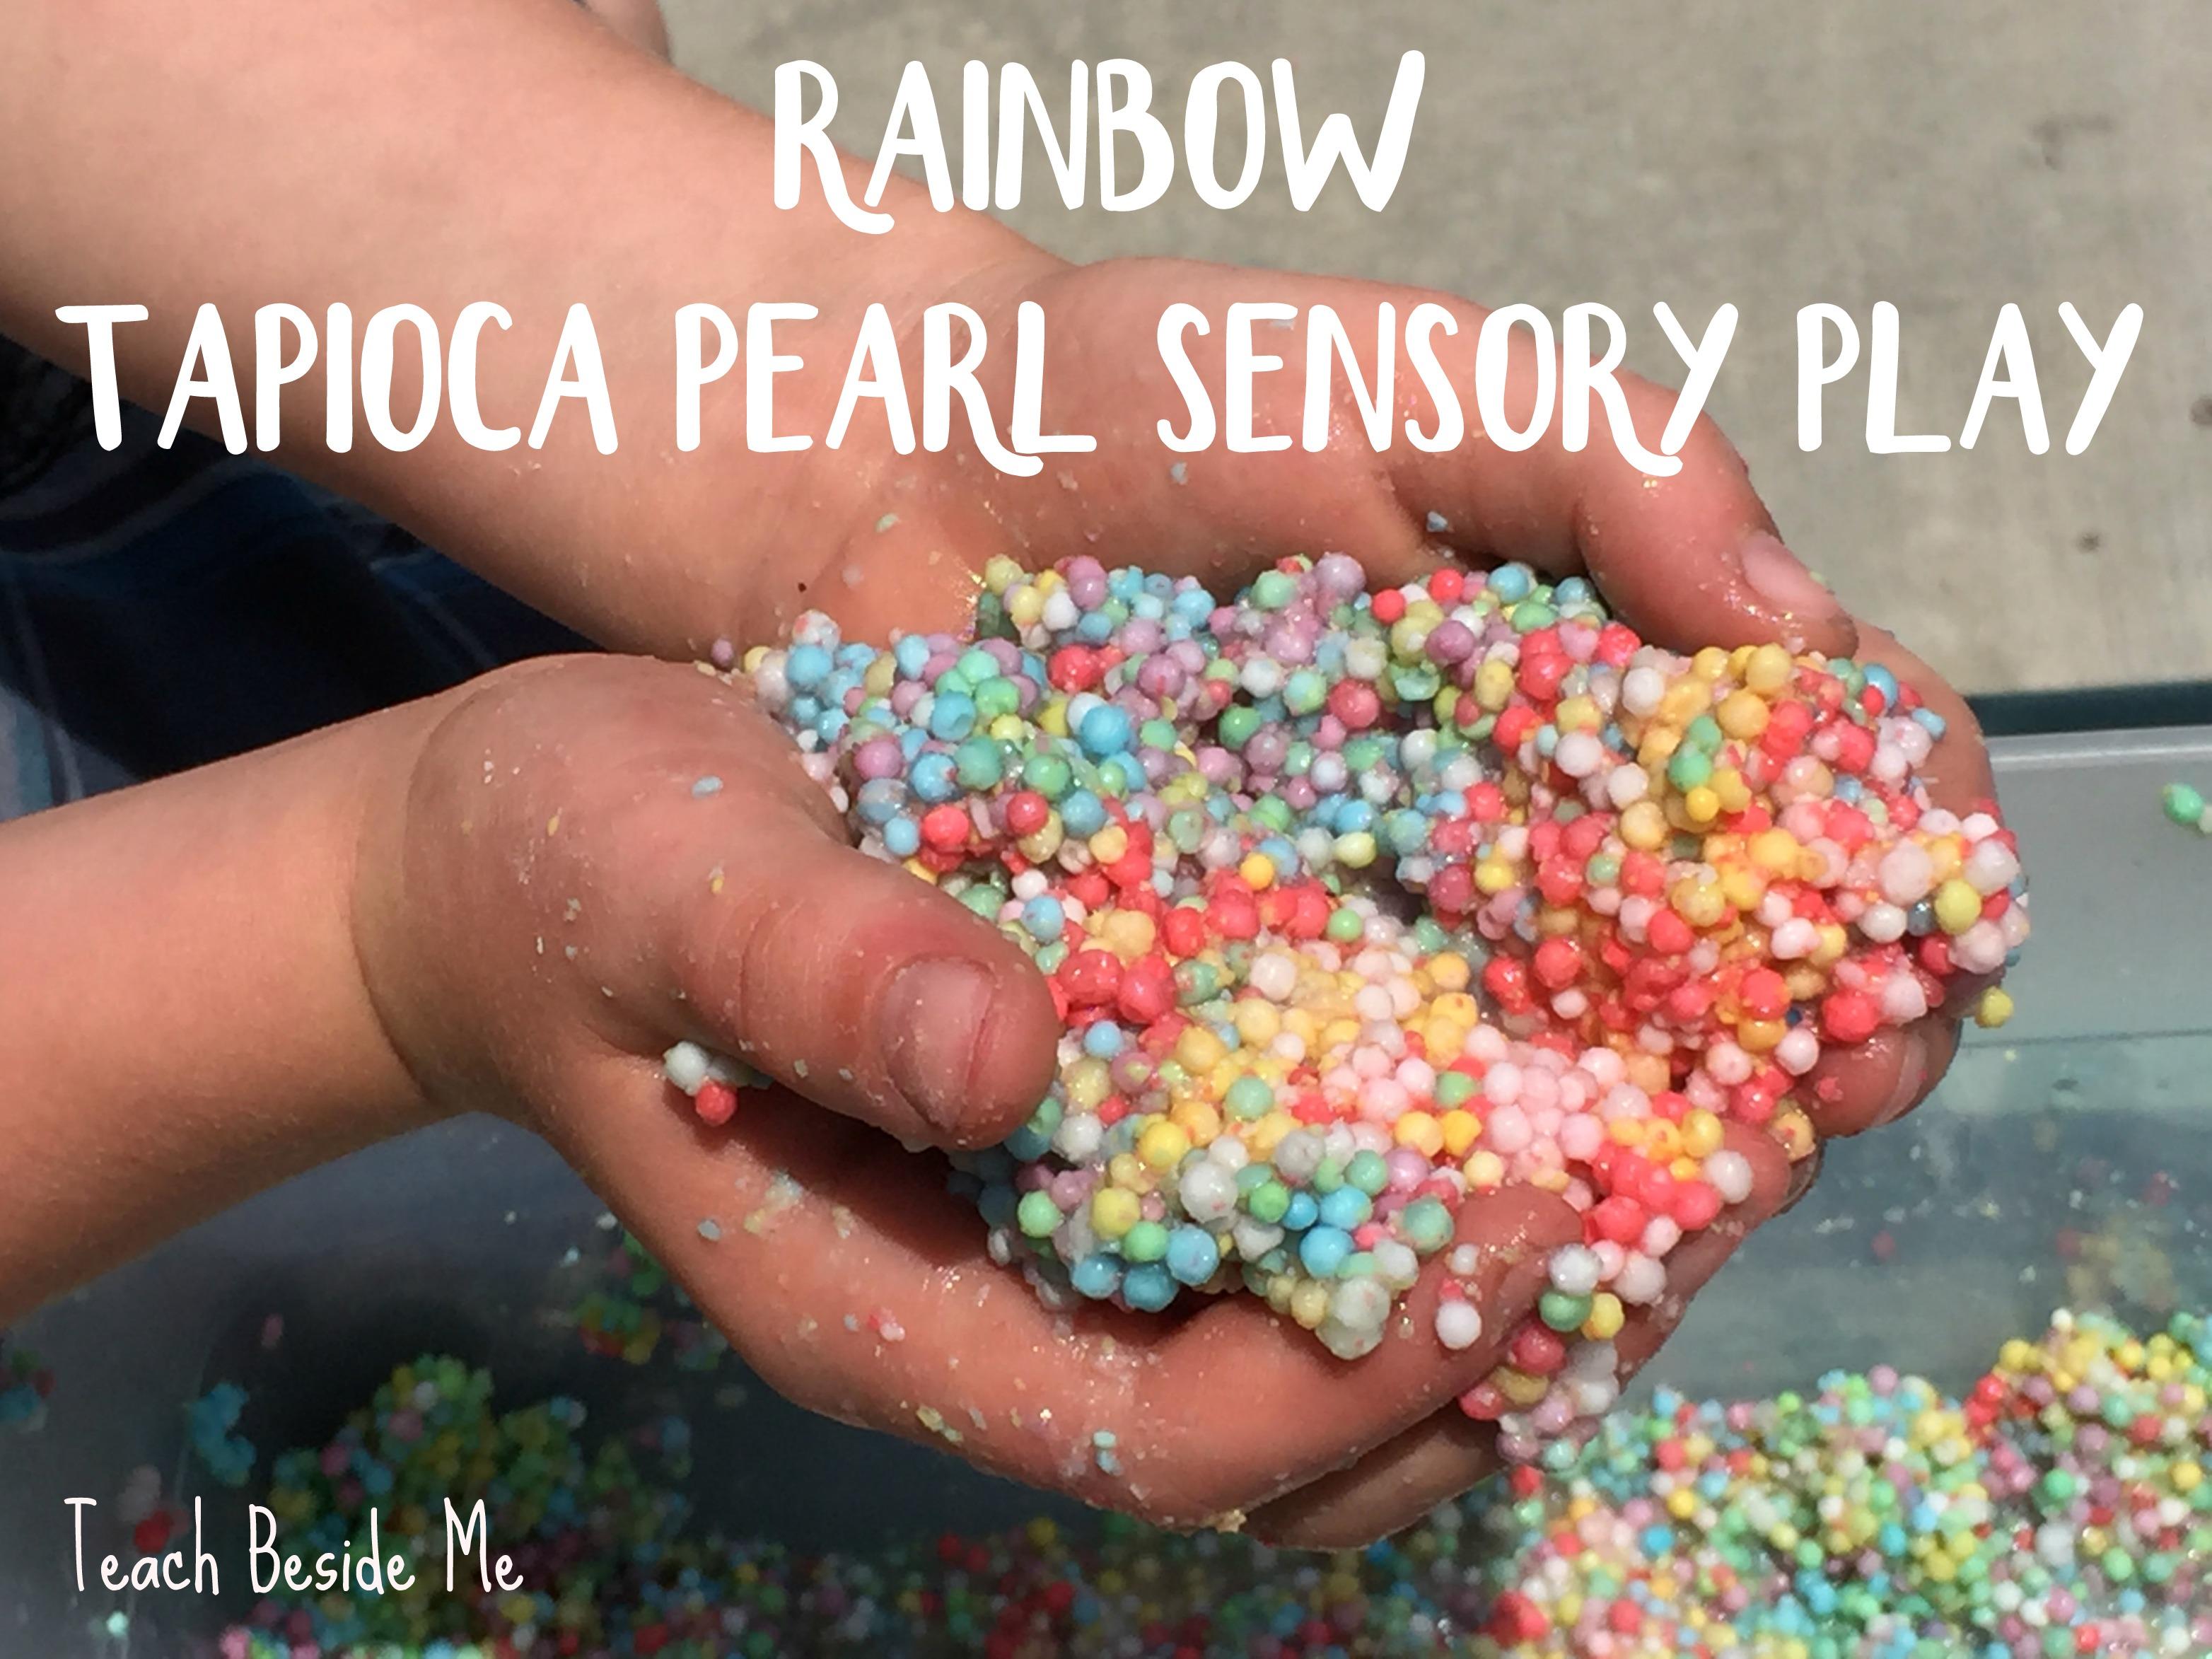 Tapioca Pearl Sensory Play